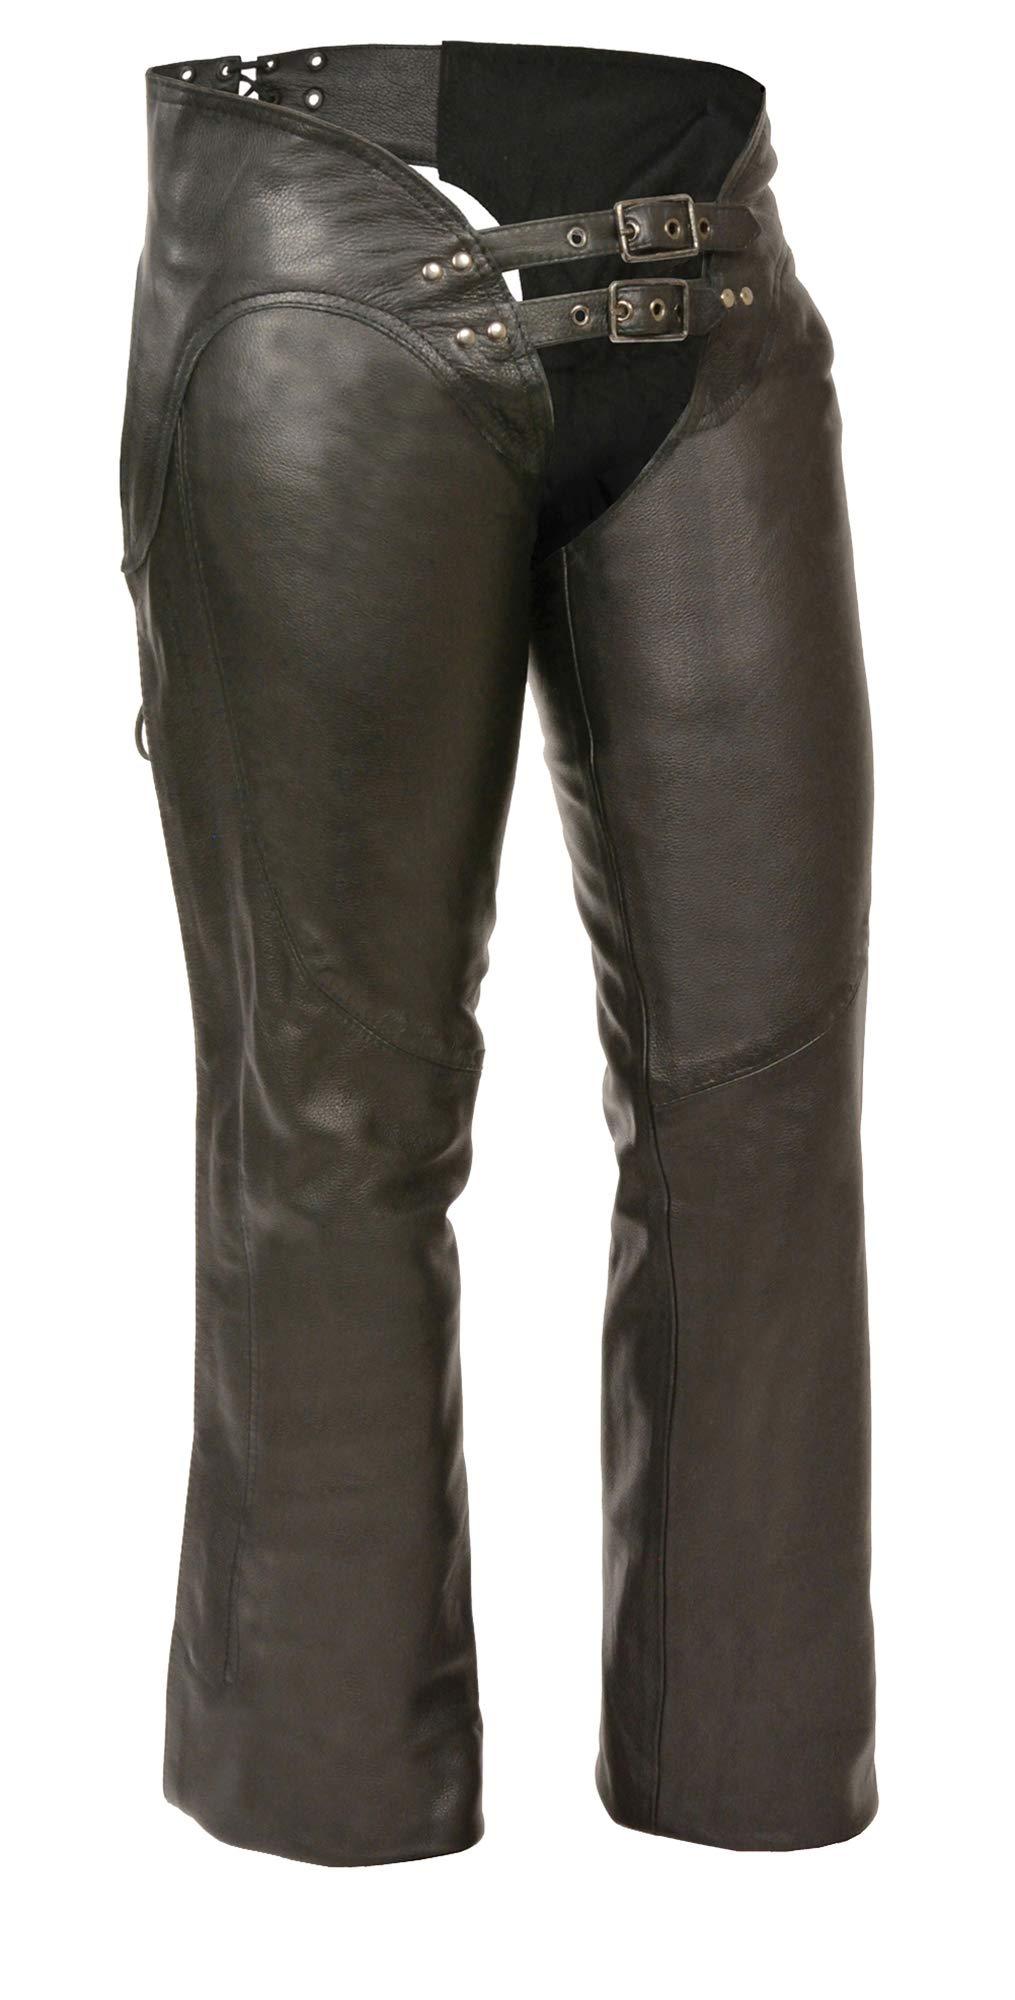 M-BOSS MOTORCYCLE APPAREL-BOS26502-BLACK-Women's low rise leather chaps.-BLACK-MEDIUM